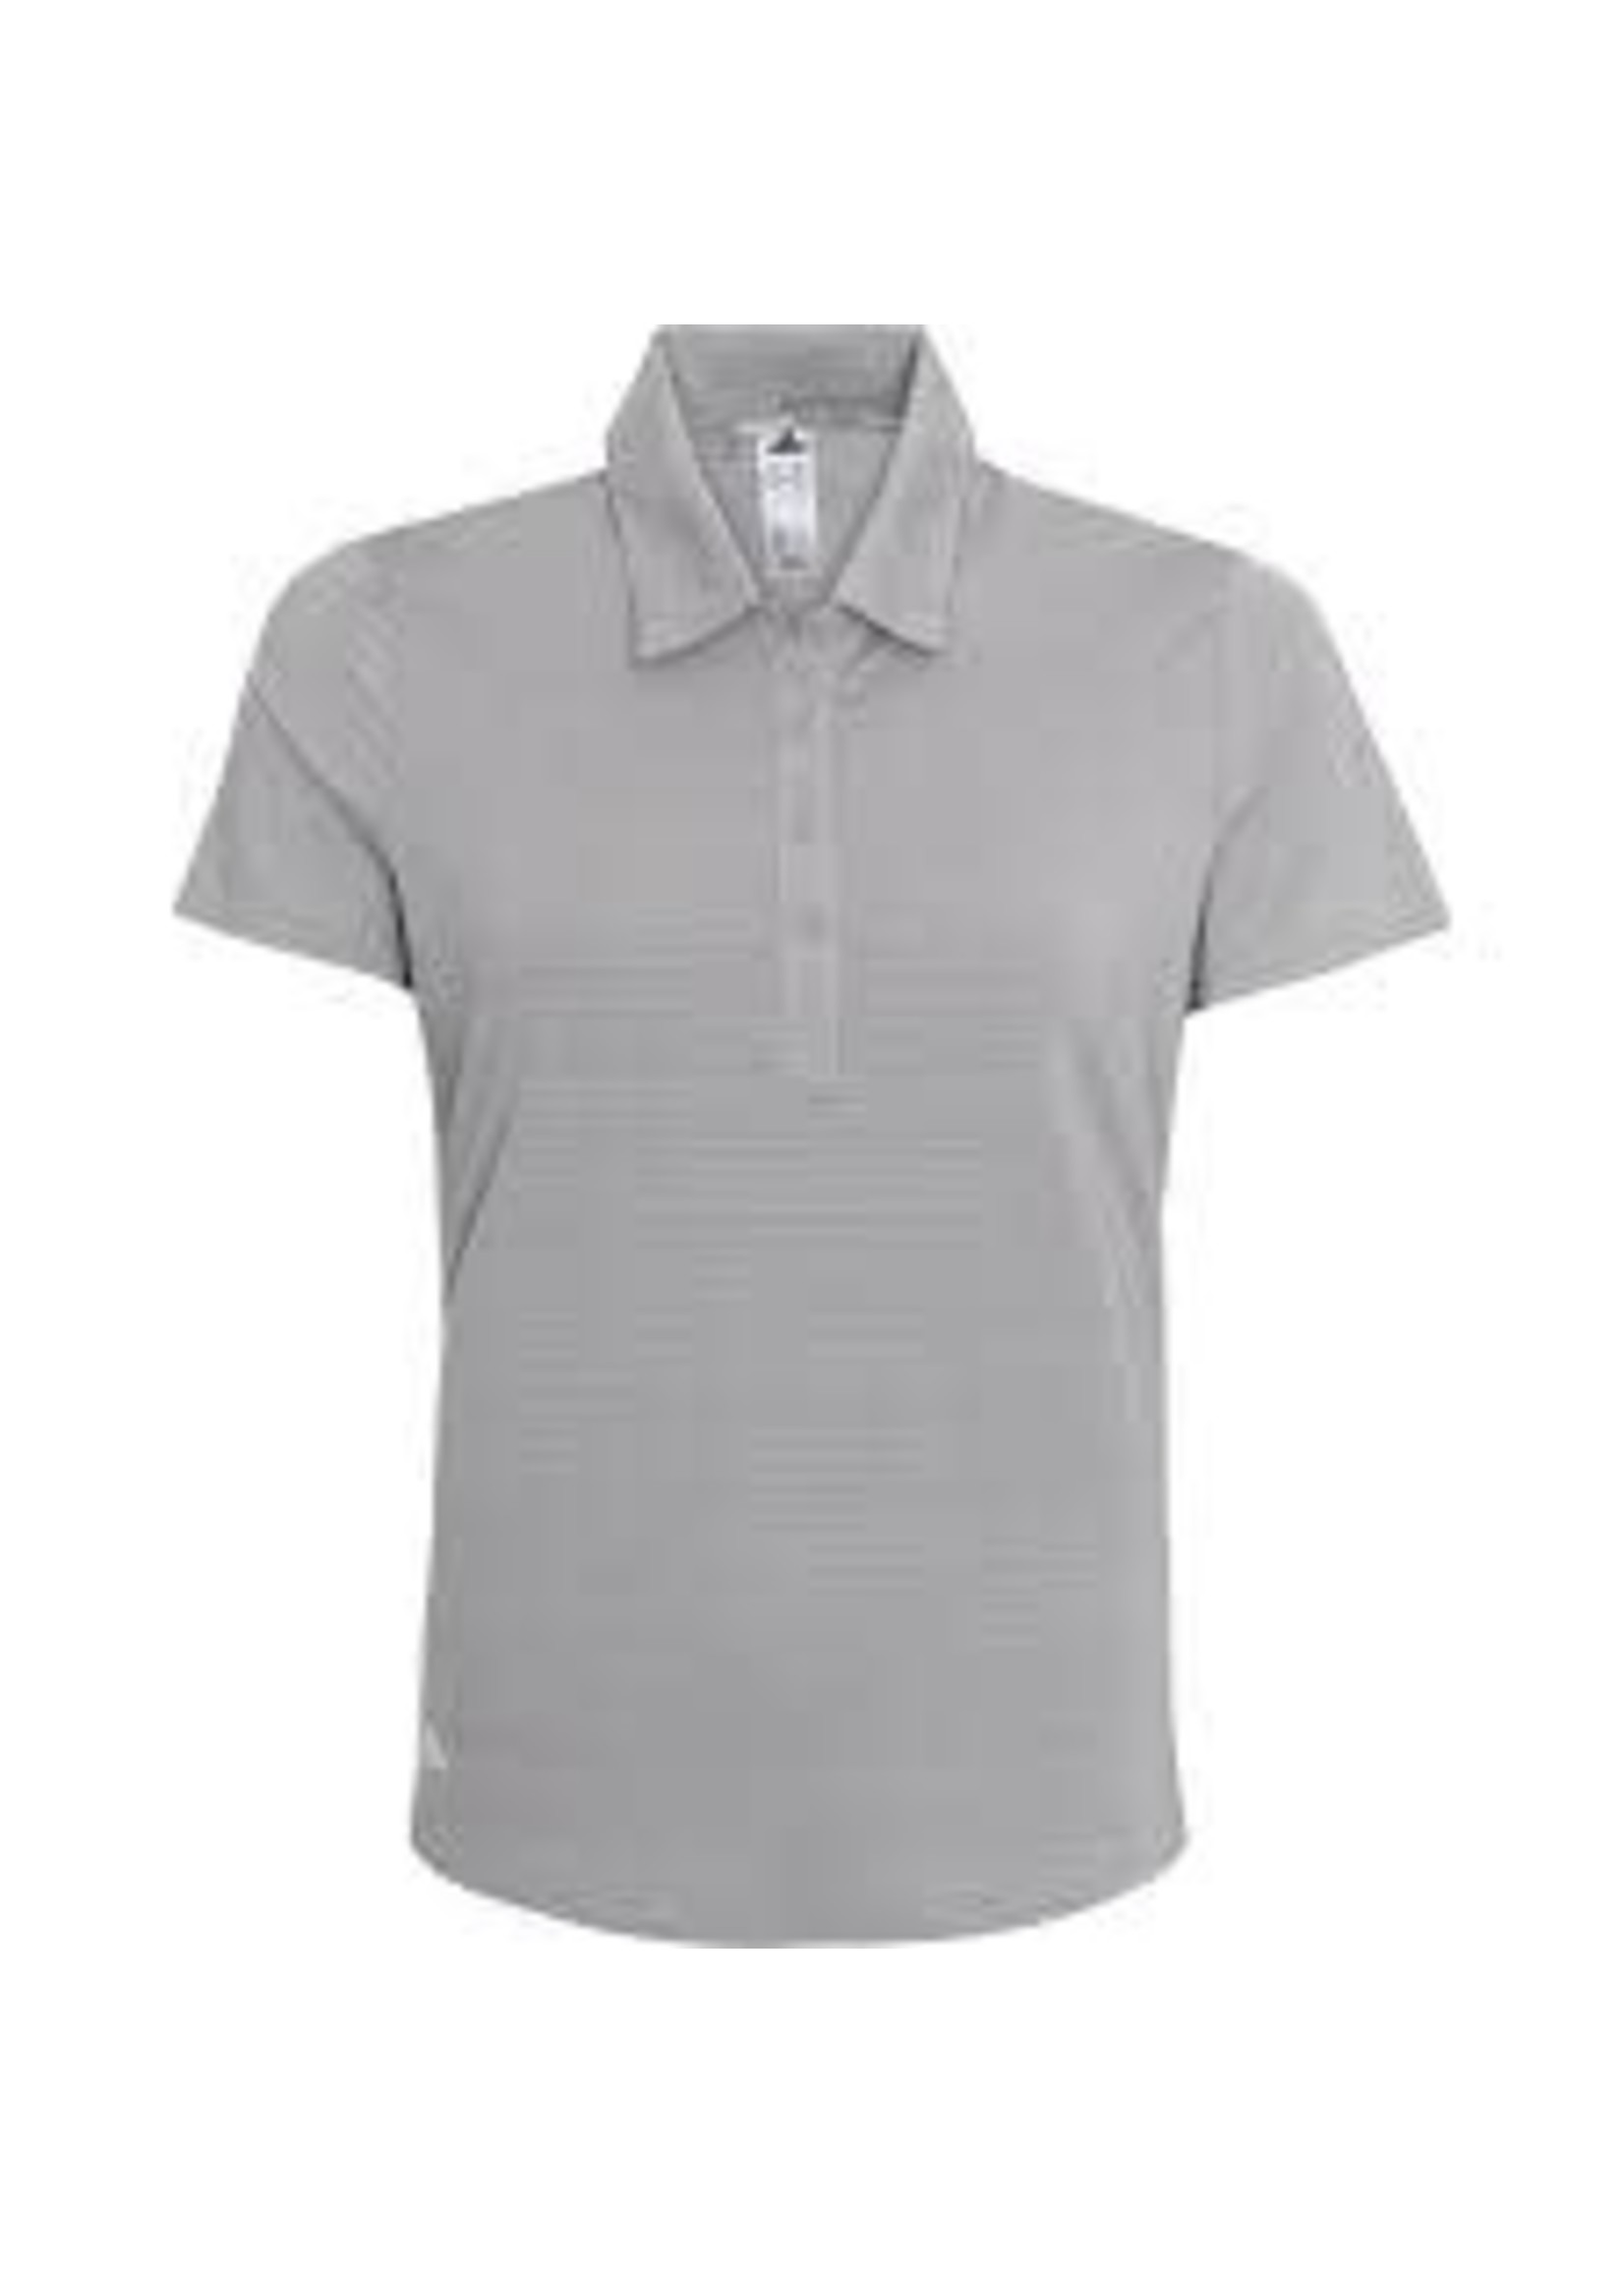 Adidas Adidas F19498 Ladies Polo Shirt Microdot Grey (2020)